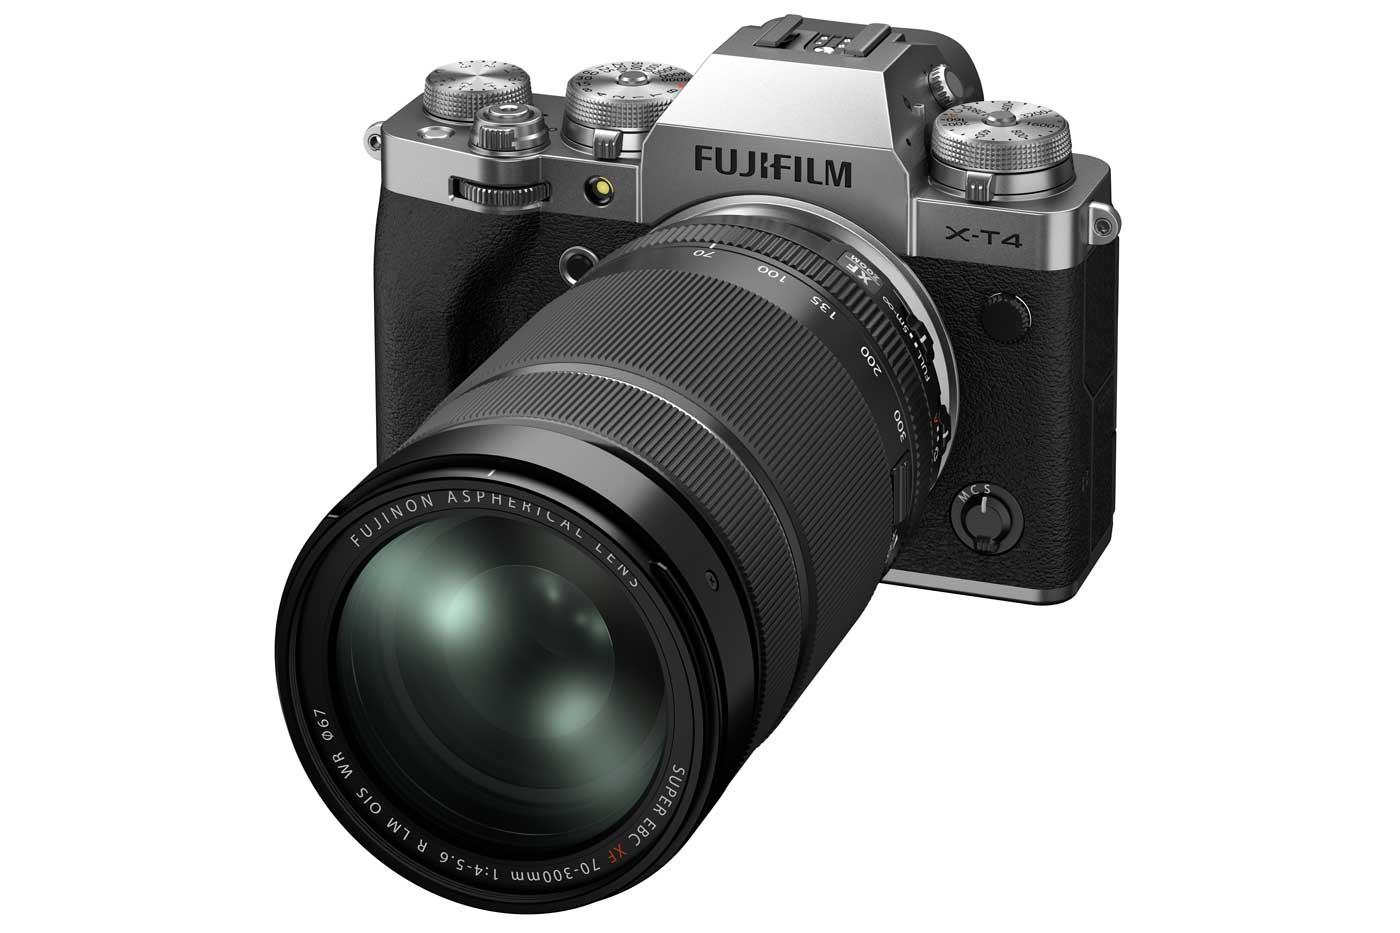 Fujifilm lance son nouveau téléobjectif polyvalent XF 70-300 mm f/4-5,6 R LM OIS WR